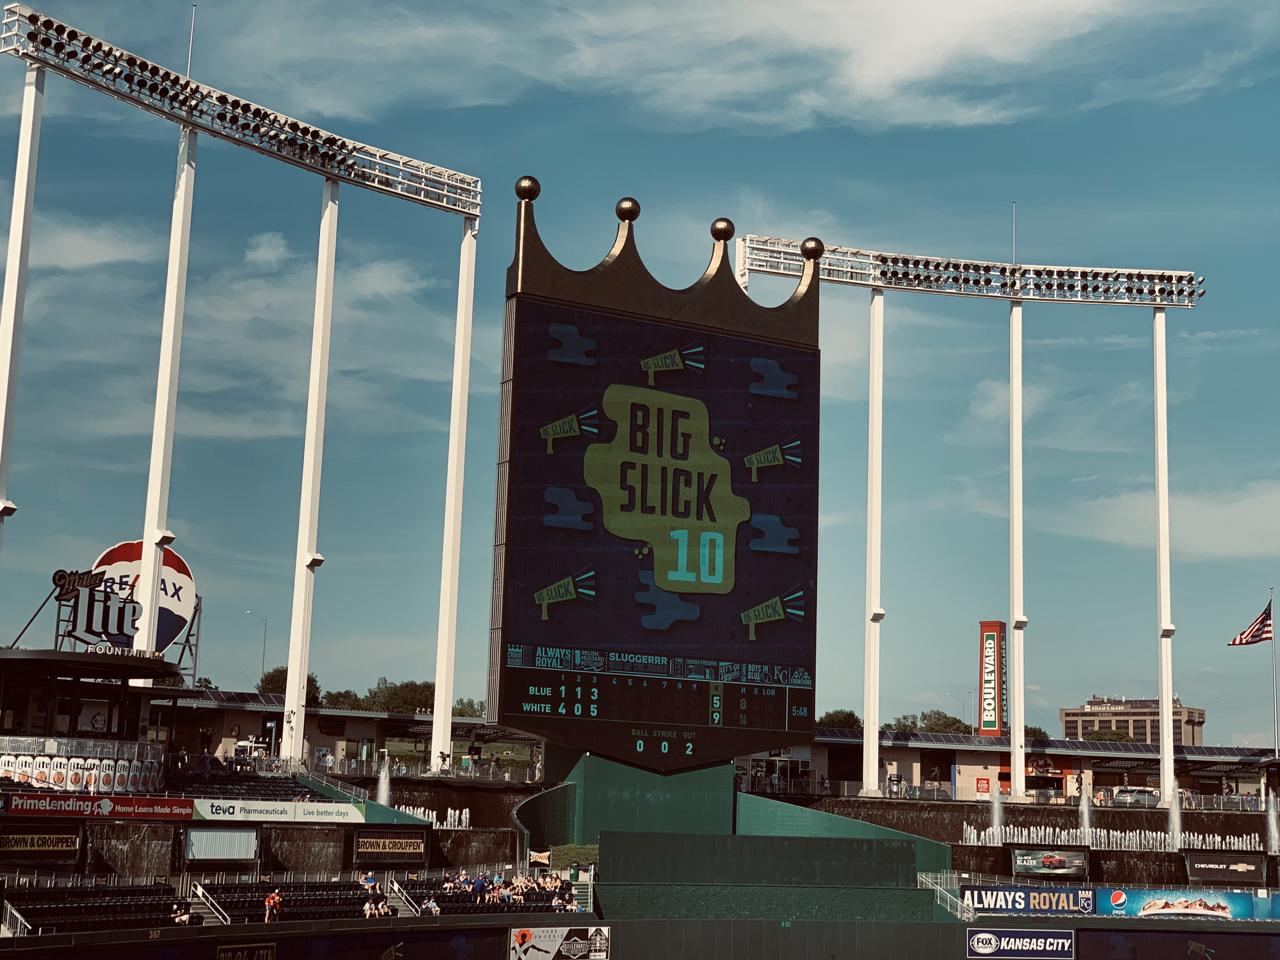 Big Slick 10 at Kauffman Stadium in Kansas City